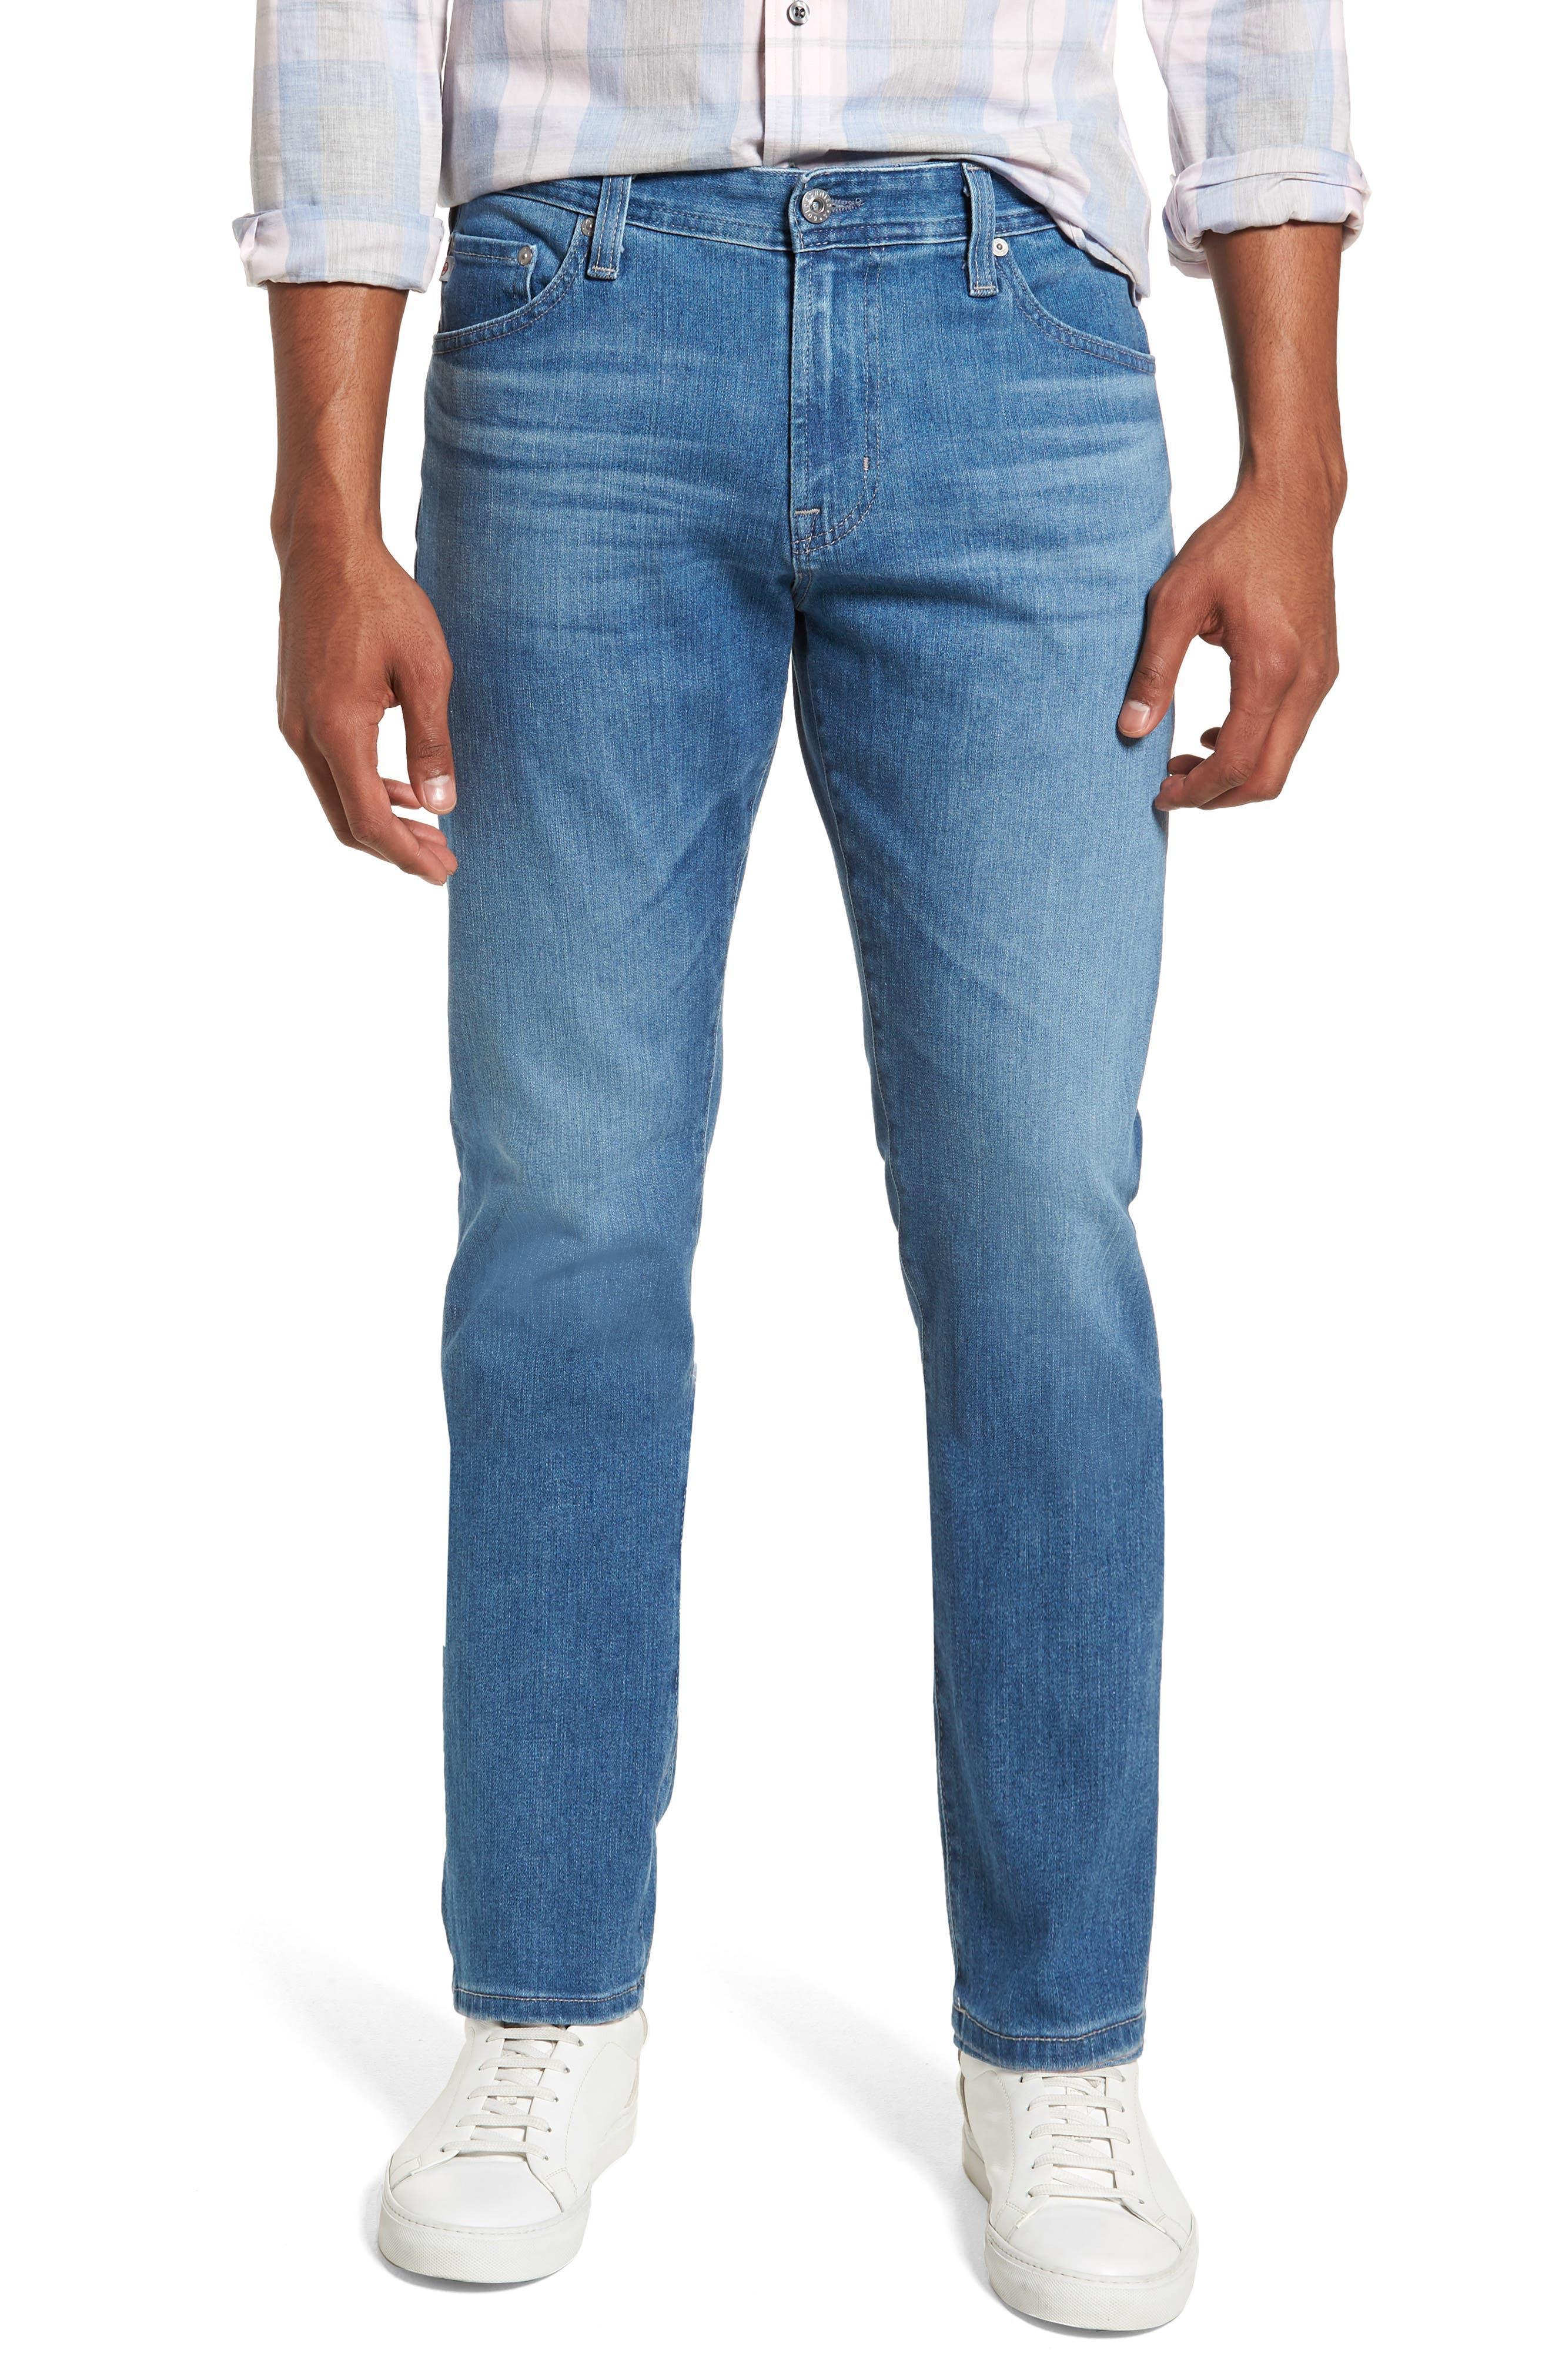 Everett Slim Straight Leg Jeans,                             Main thumbnail 1, color,                             SEA WAVE